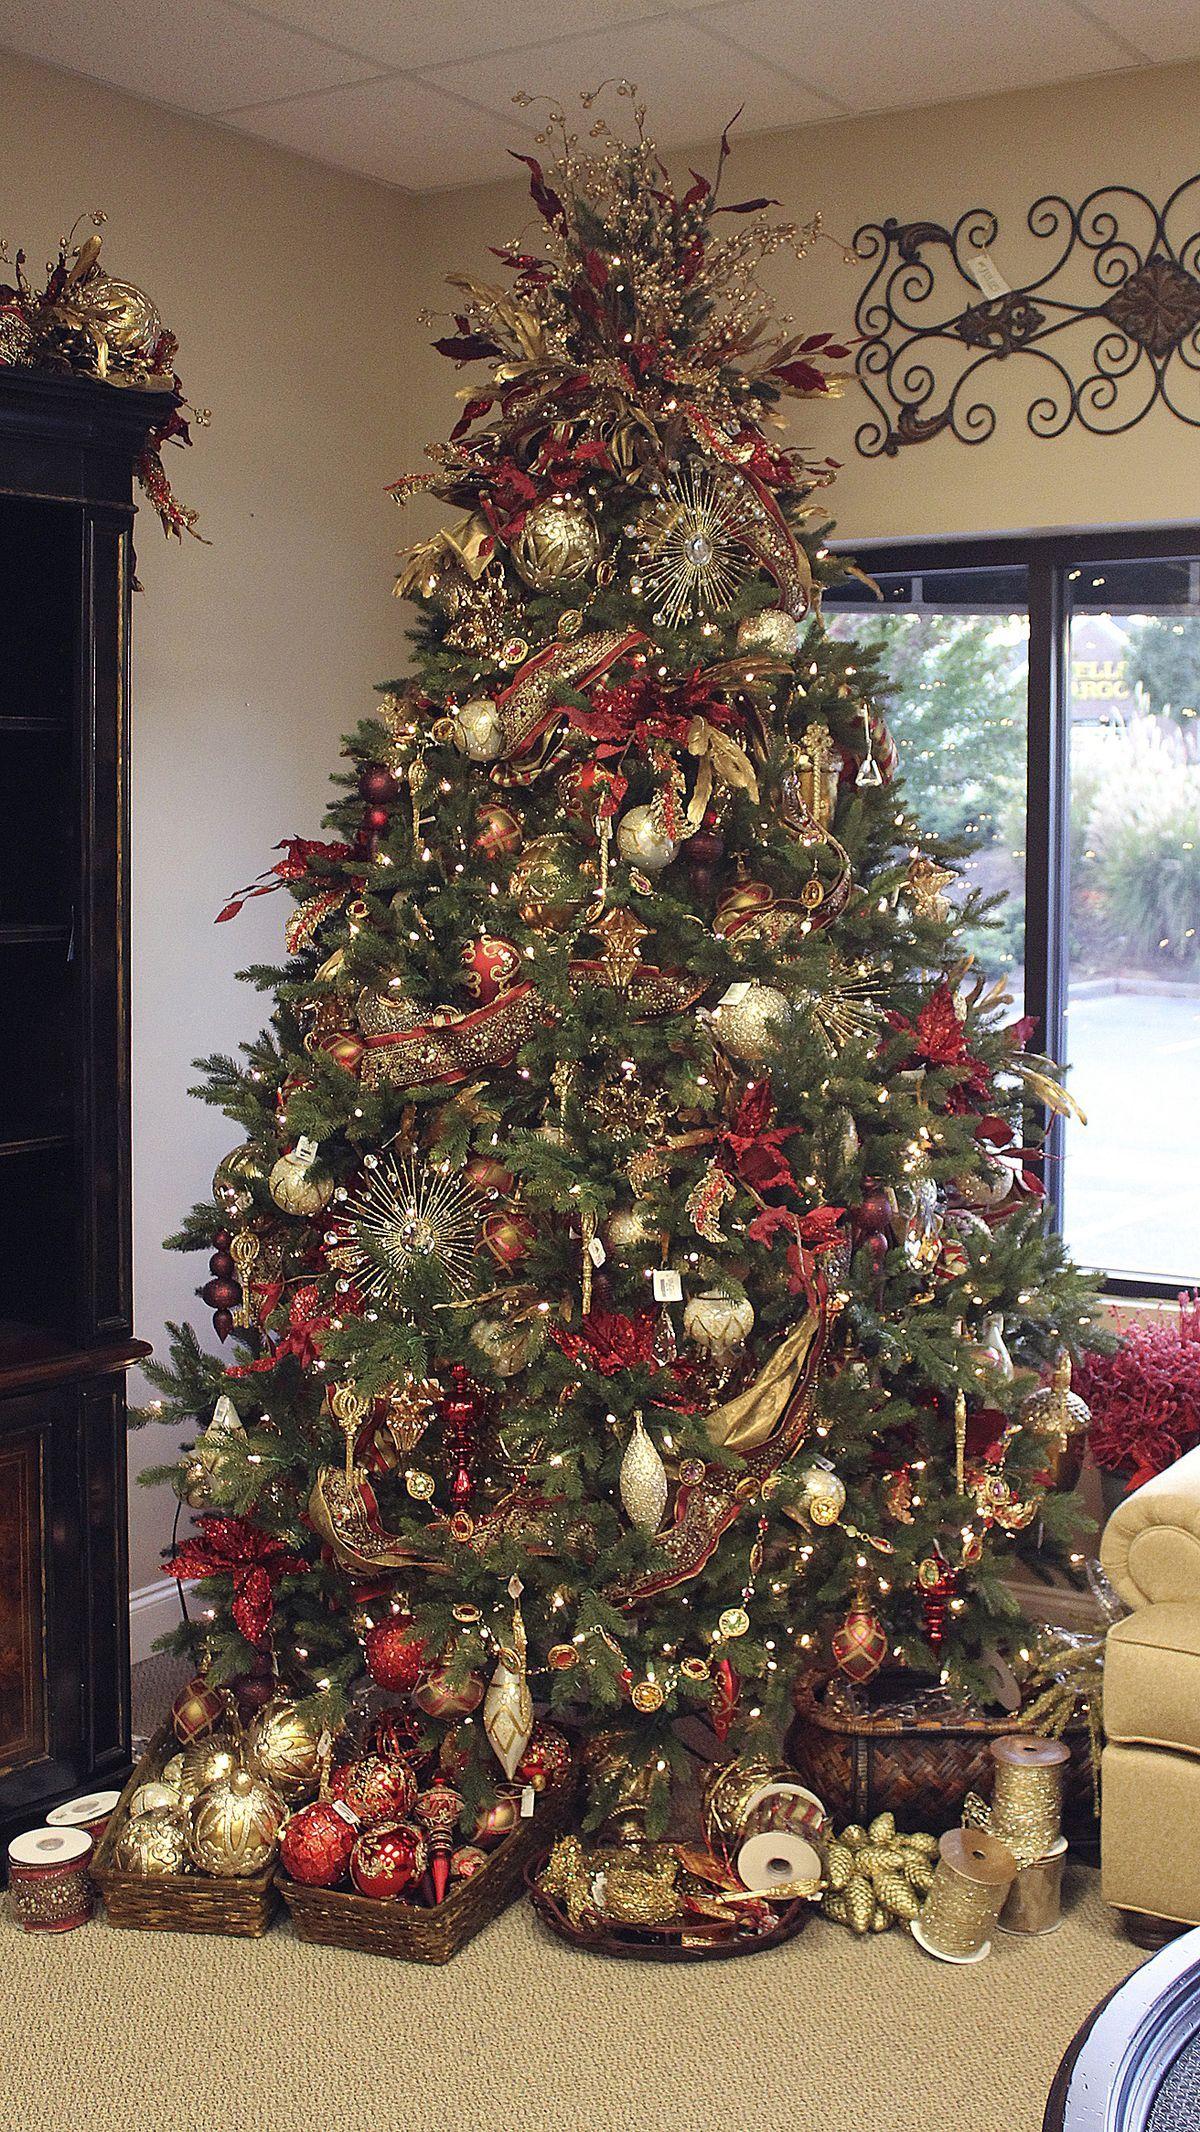 22b3427aba8be7e768c42ab8815a3abc Jpg 1 200 2 132 Pixels Traditional Christmas Decorations Traditional Christmas Tree Christmas Decorations